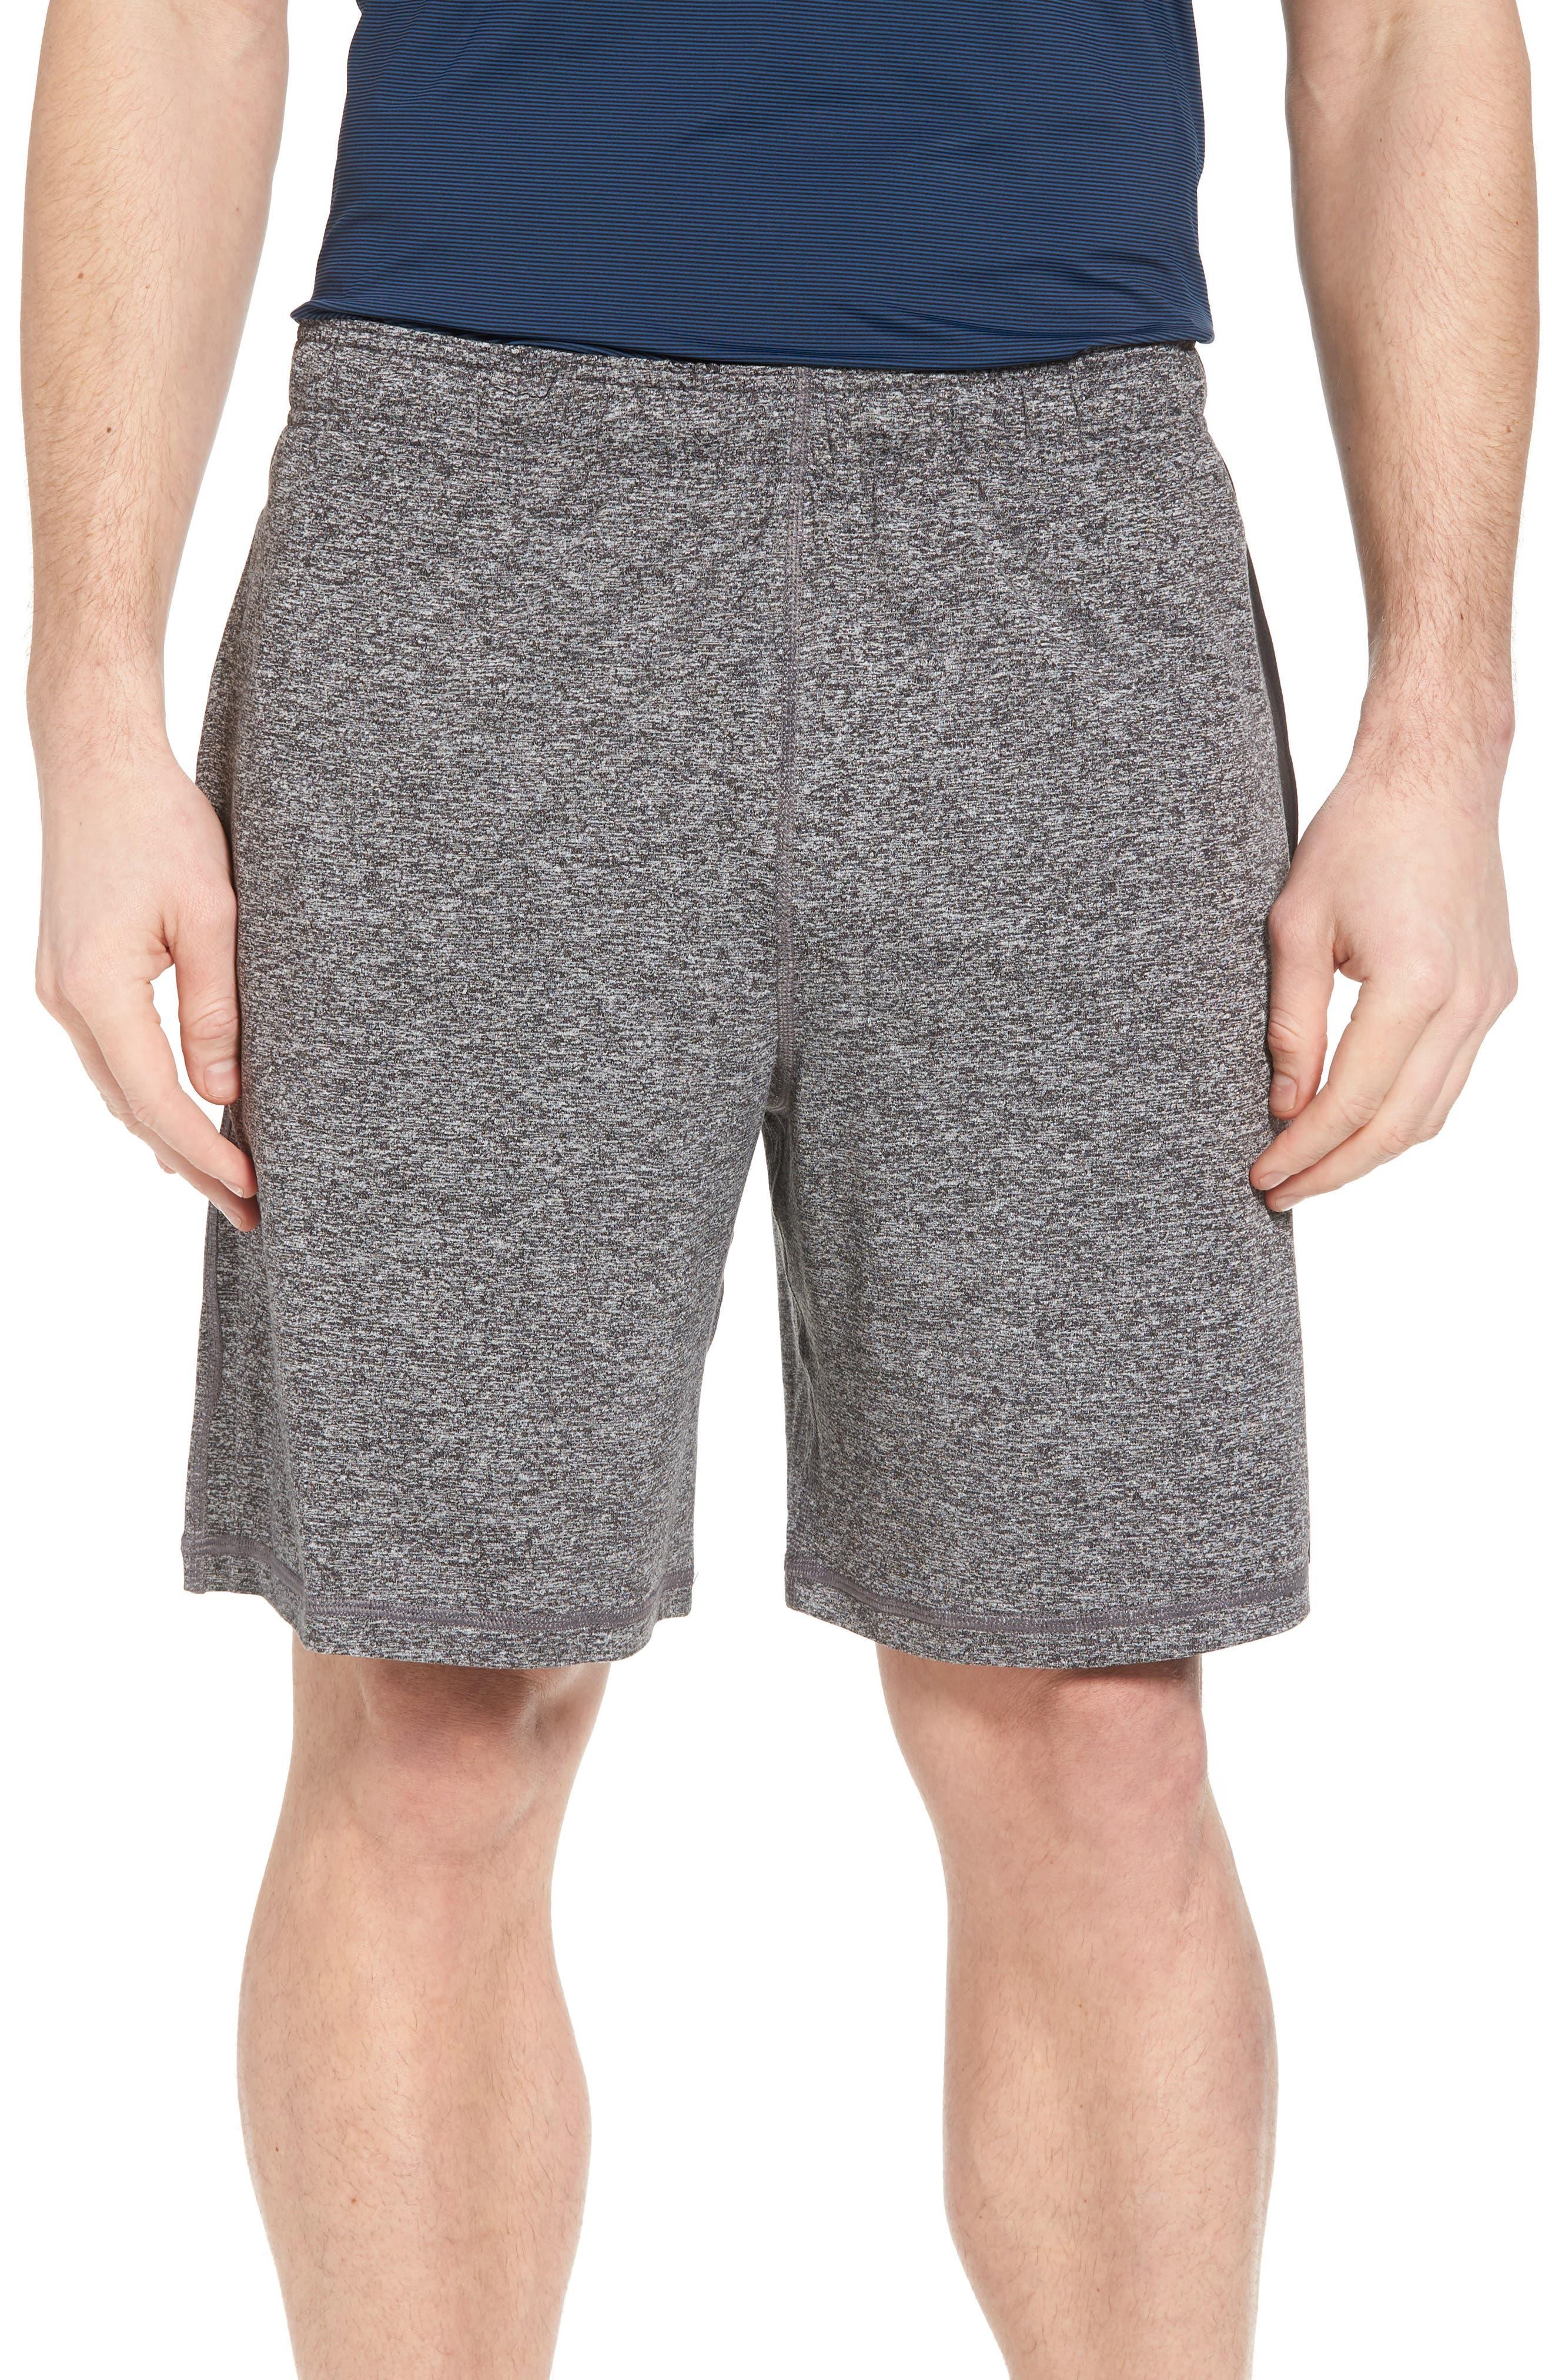 SODO 'Go To' Moisture Wicking Stretch Shorts